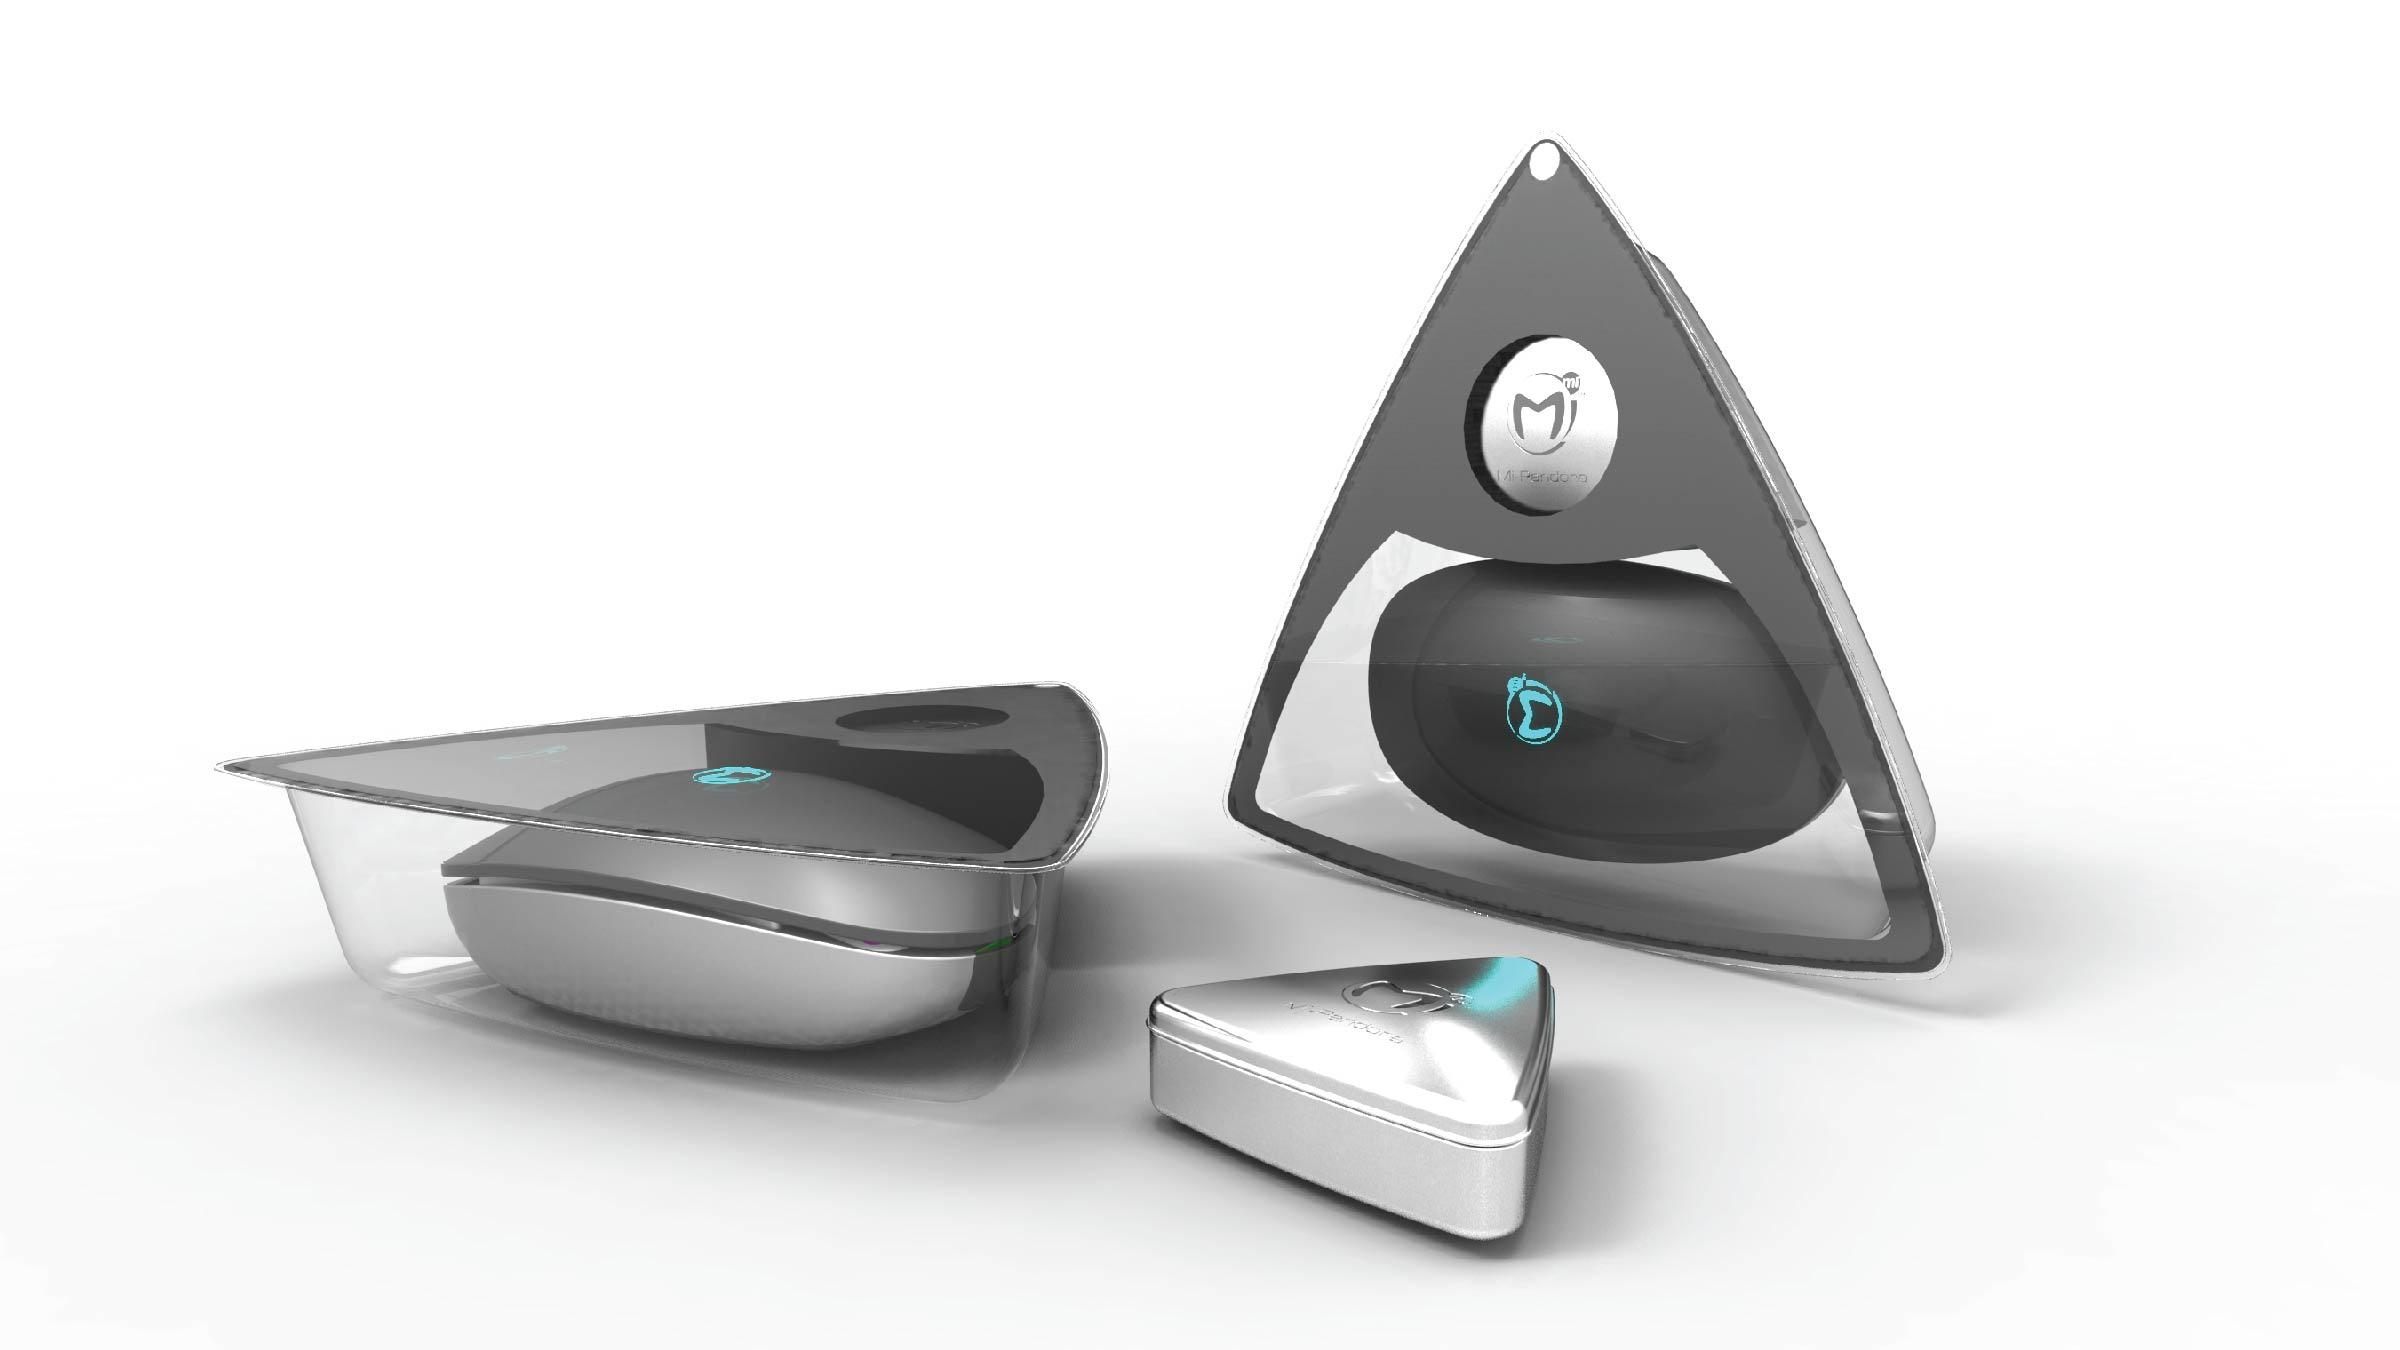 Mi-Fone Charger Packaing Design Presentation 24092012-01